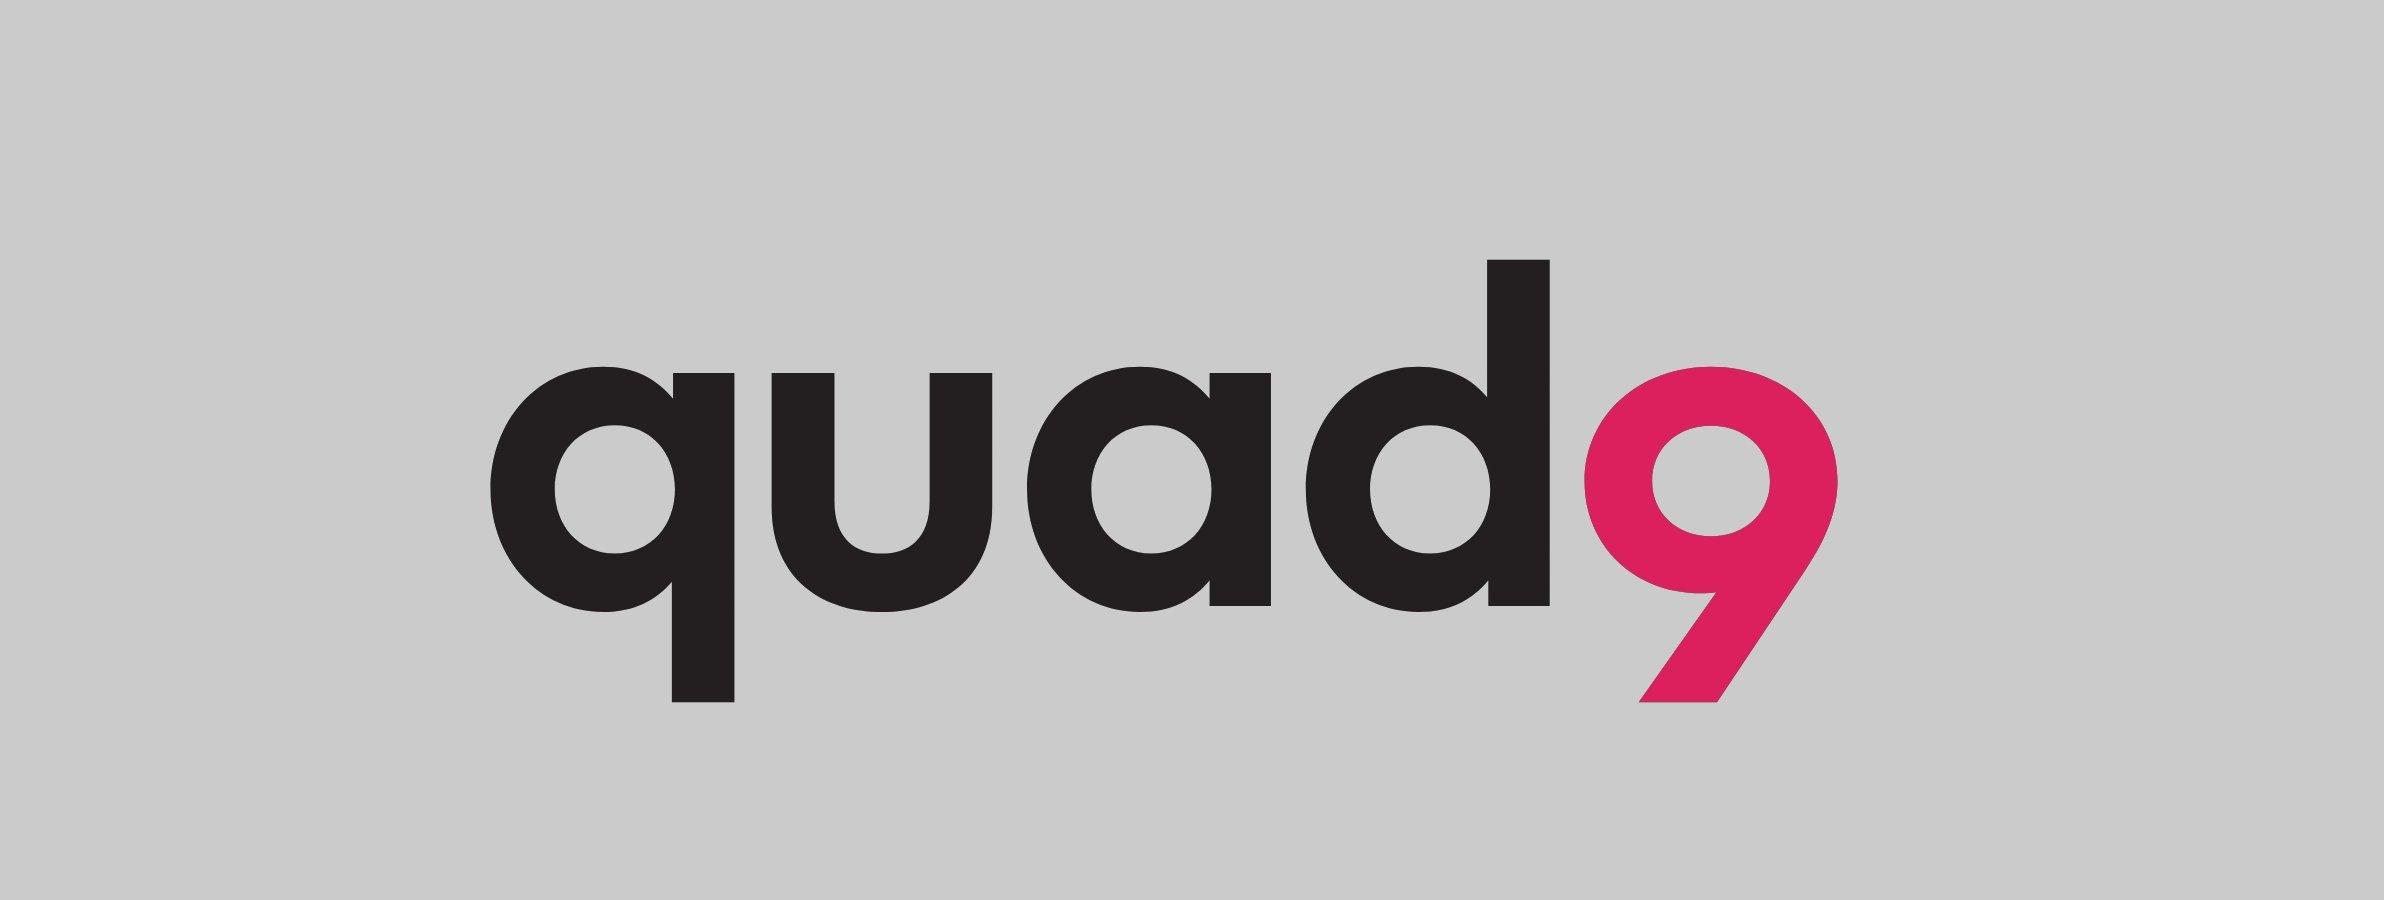 quad9 - Quad9 DNS service transfer to Switzerland